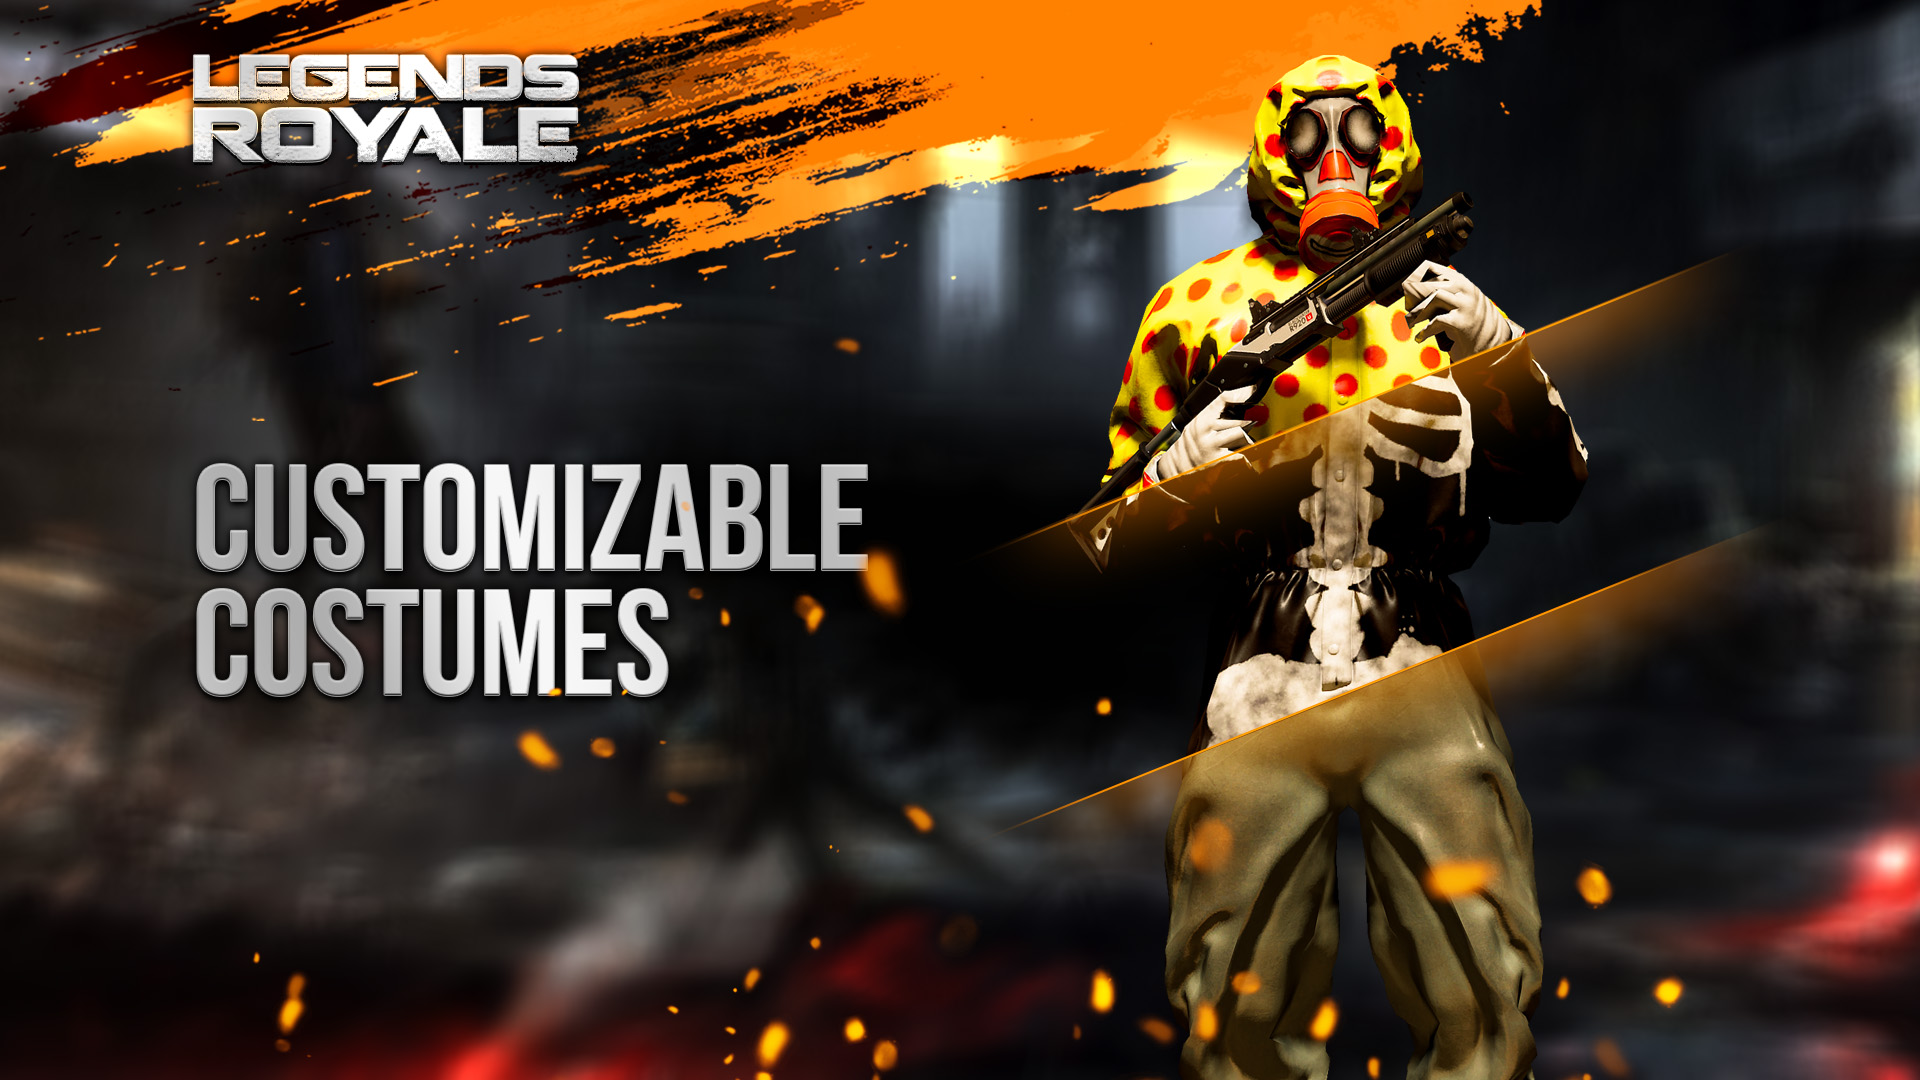 Legends Royale screenshot 1